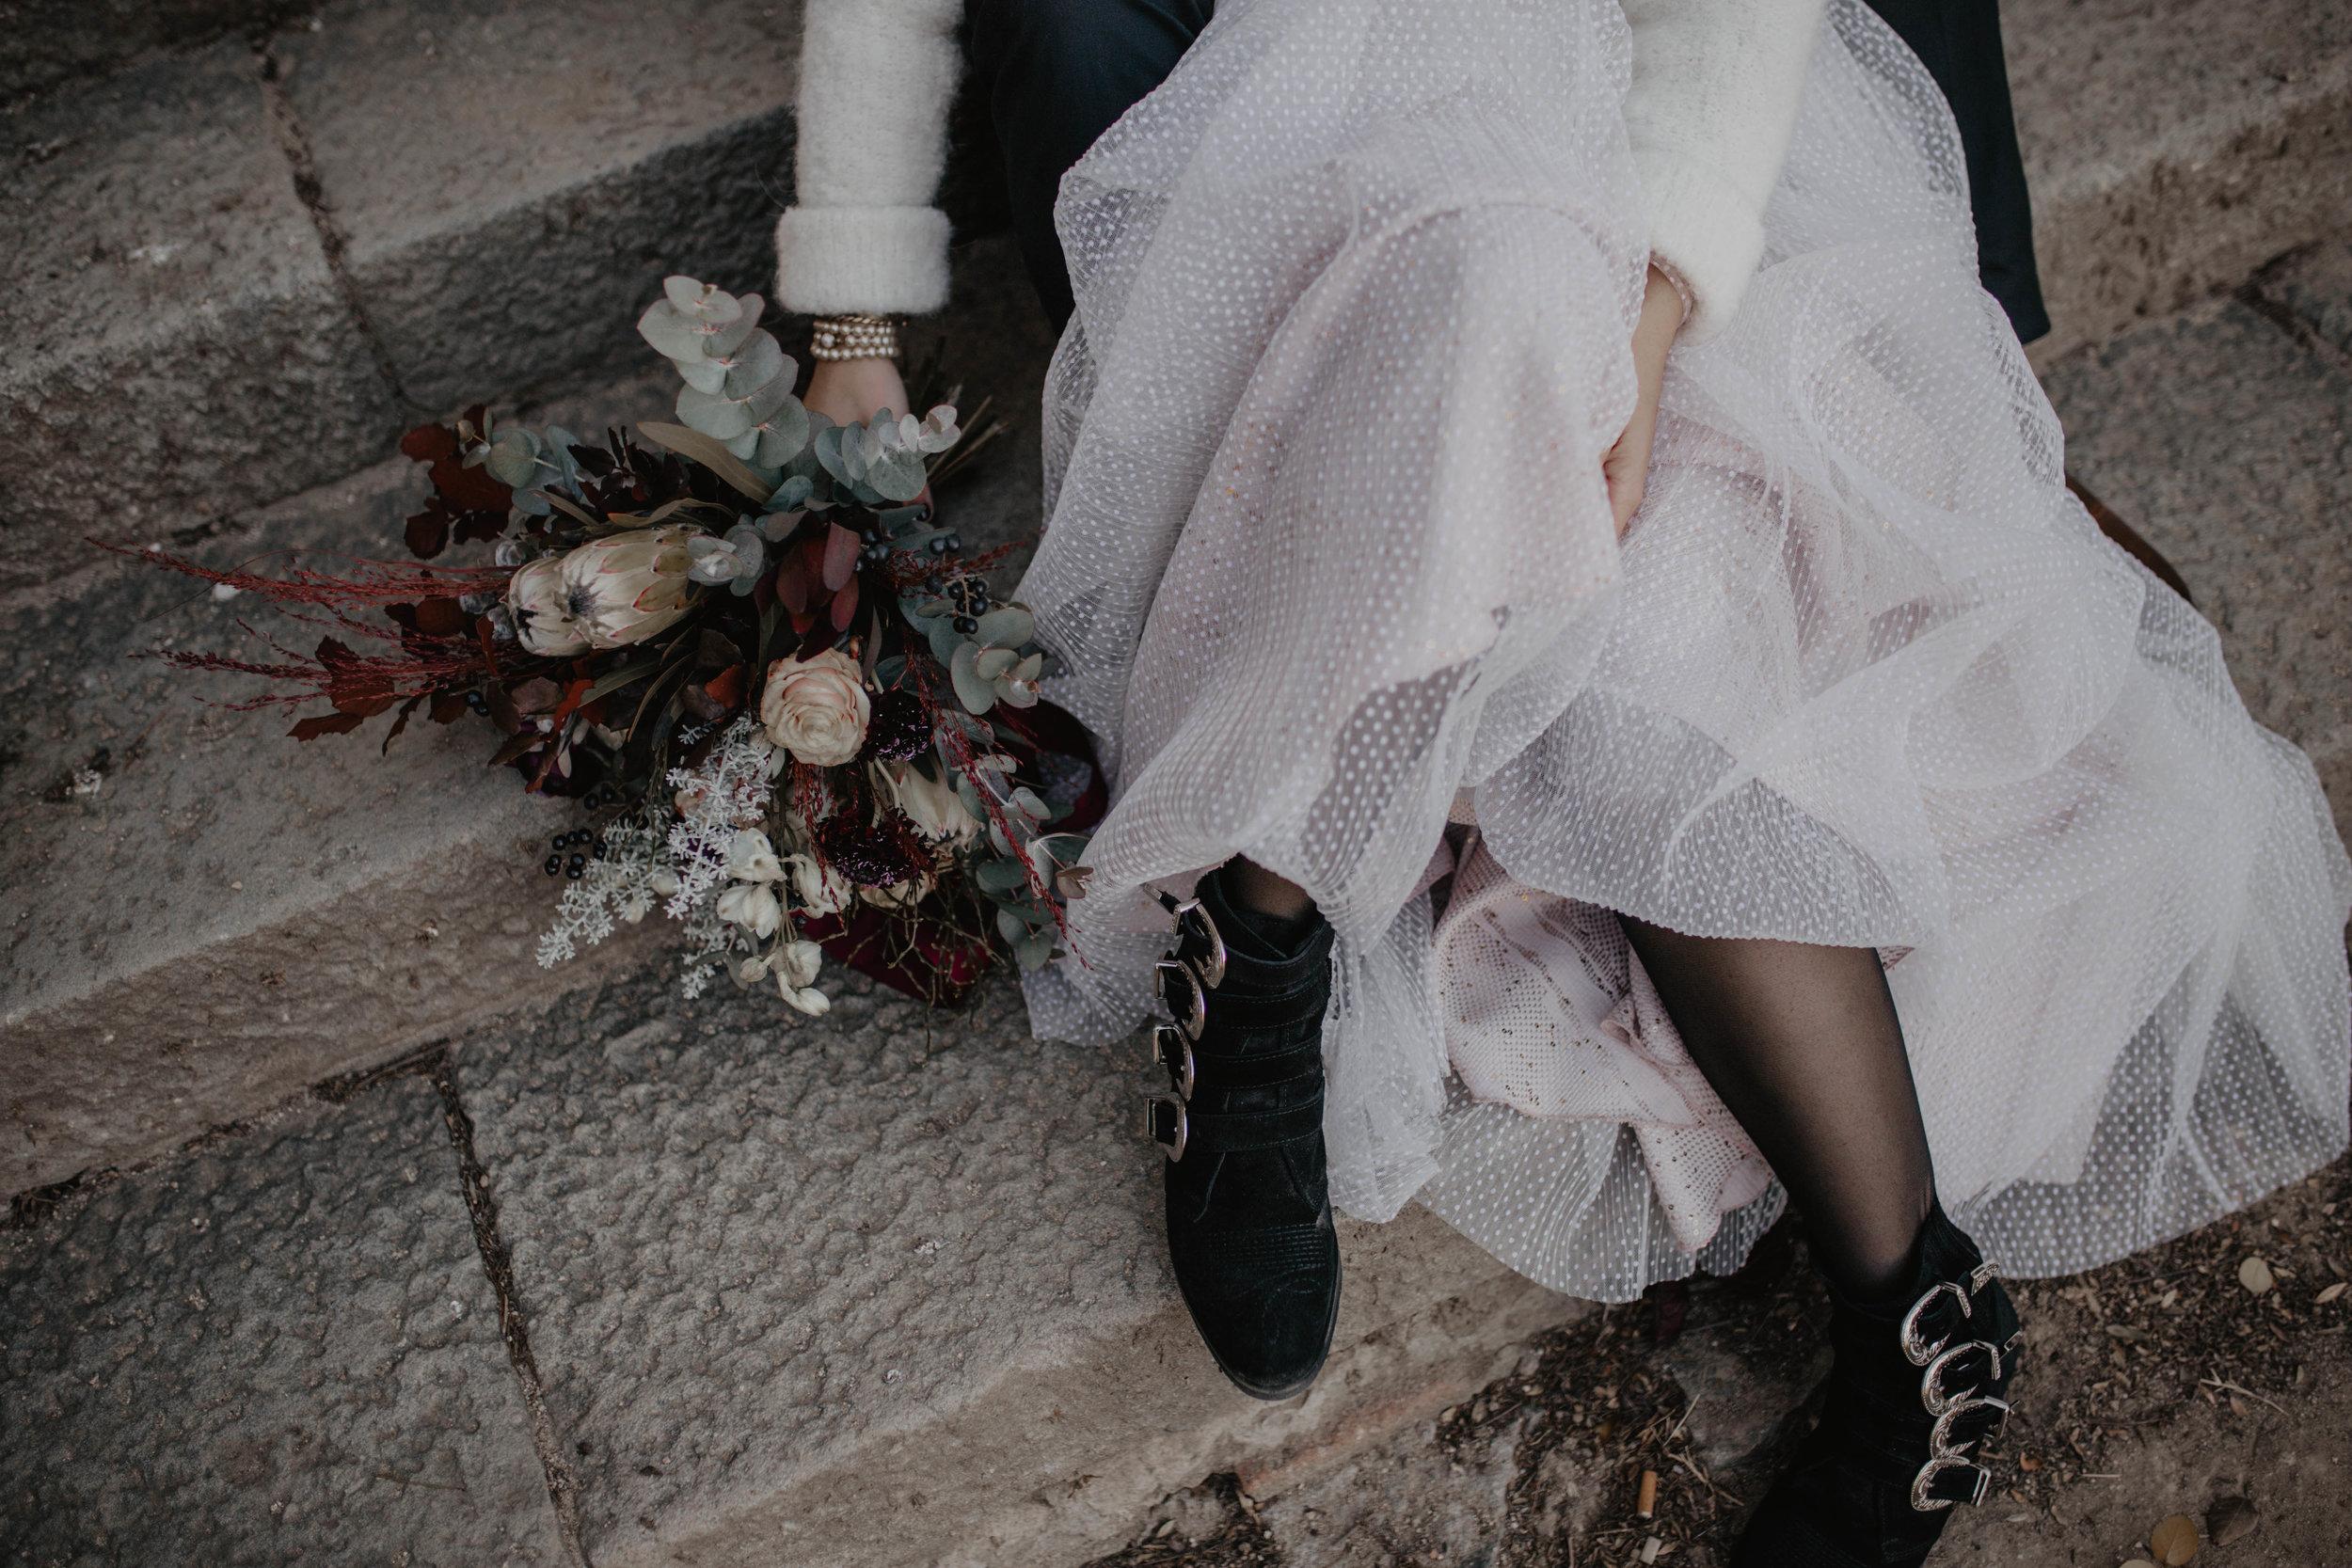 thenortherngirlphotography-photography-weddingphotography-couple-bodasconestilo-bodasenbarcelona-martadavid-349.jpg